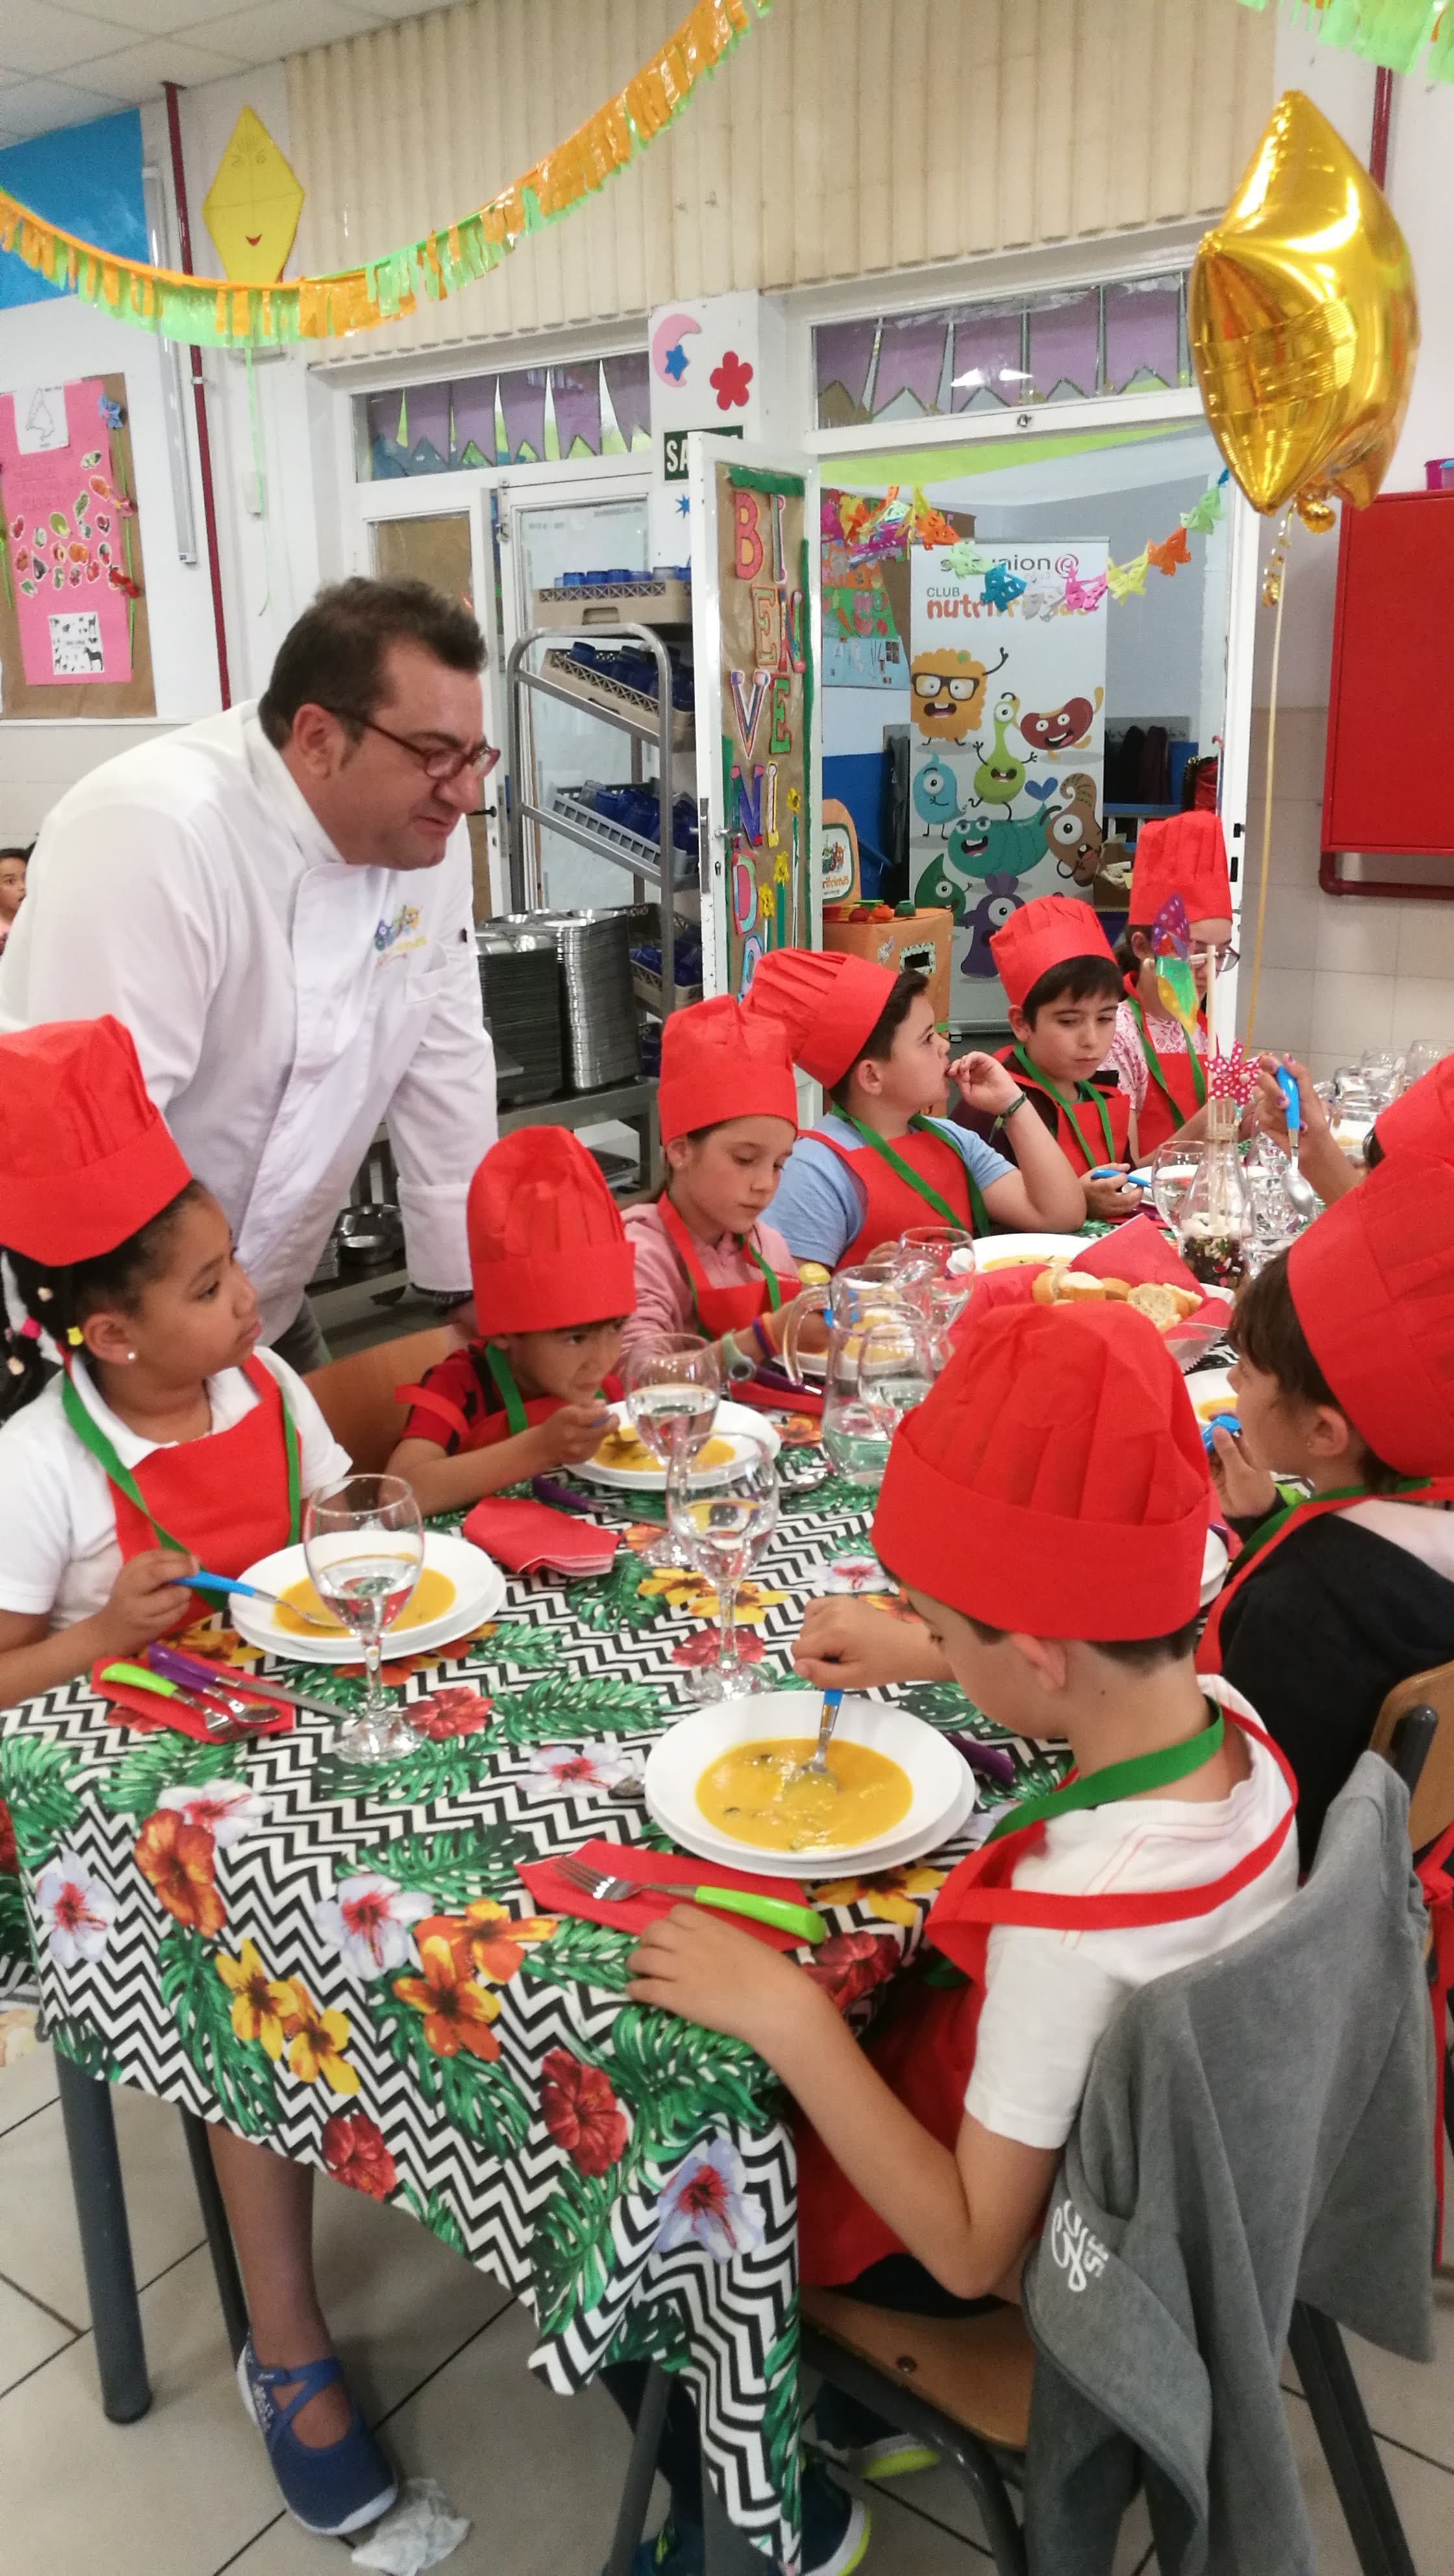 Visita del chef Sergio Fernández - Nutrifriends